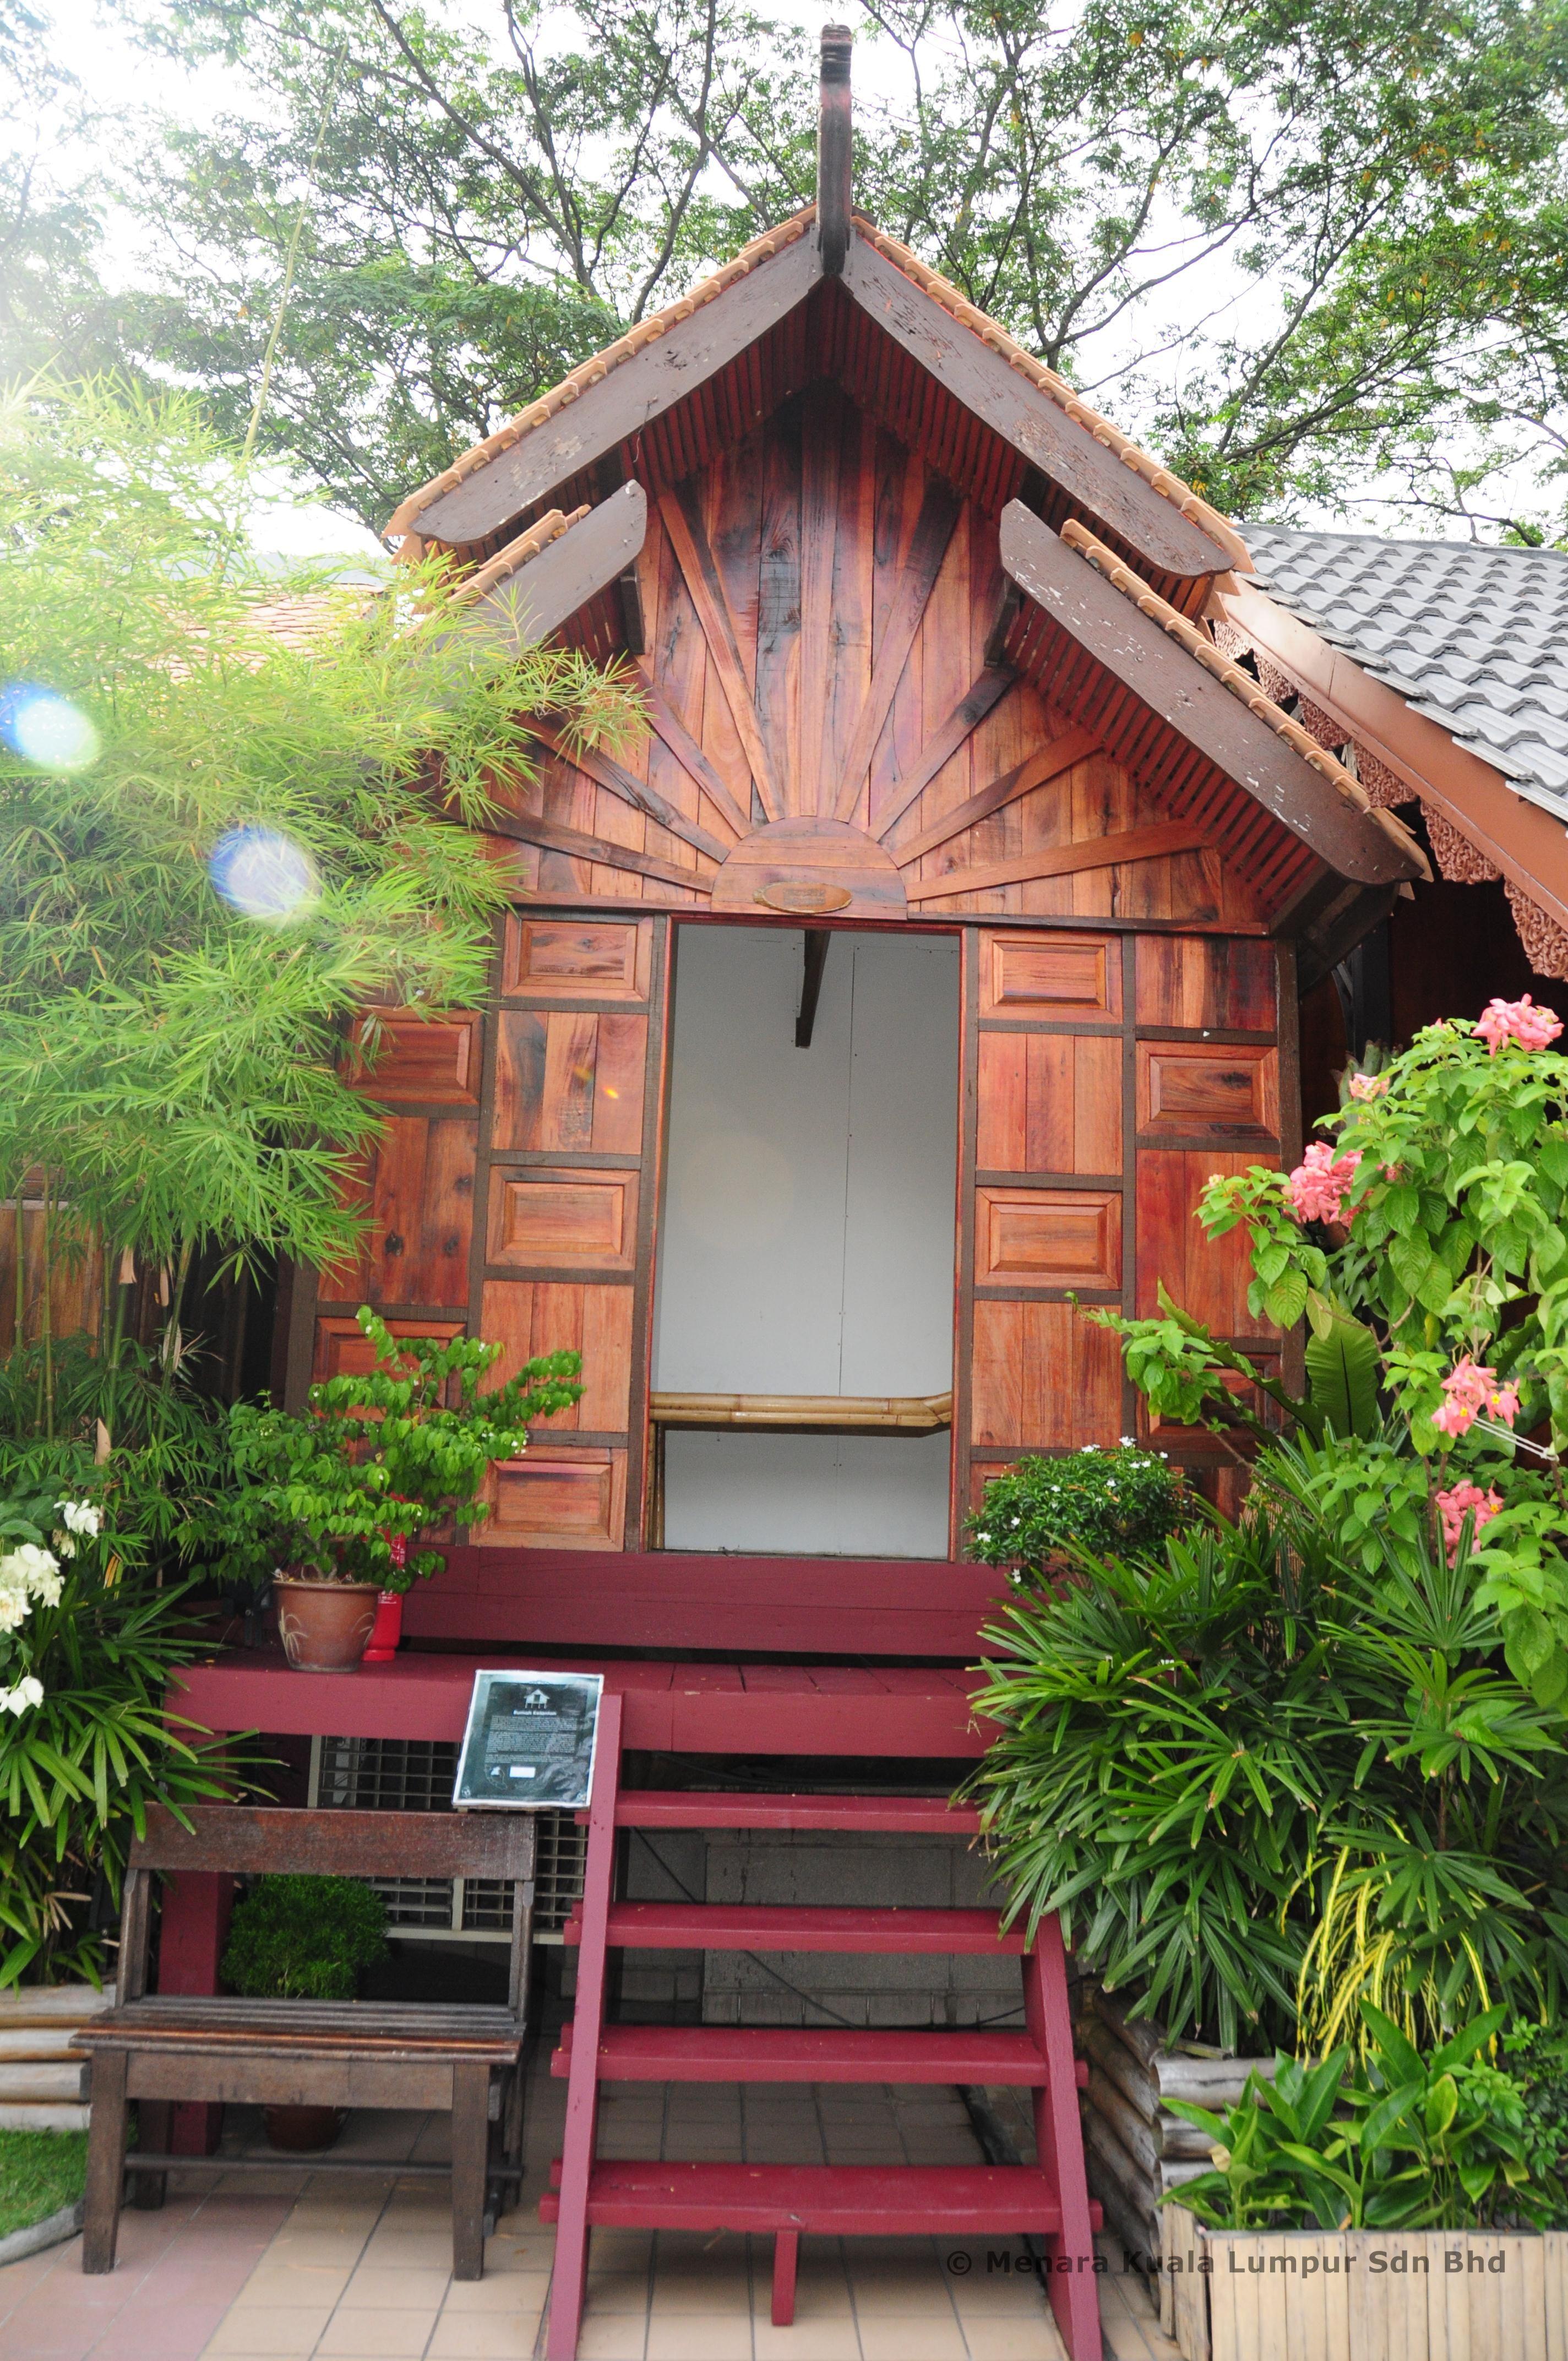 Home Design Ideas Malaysia: Kelantan Traditional House At 1 Malaysia Cultural Village